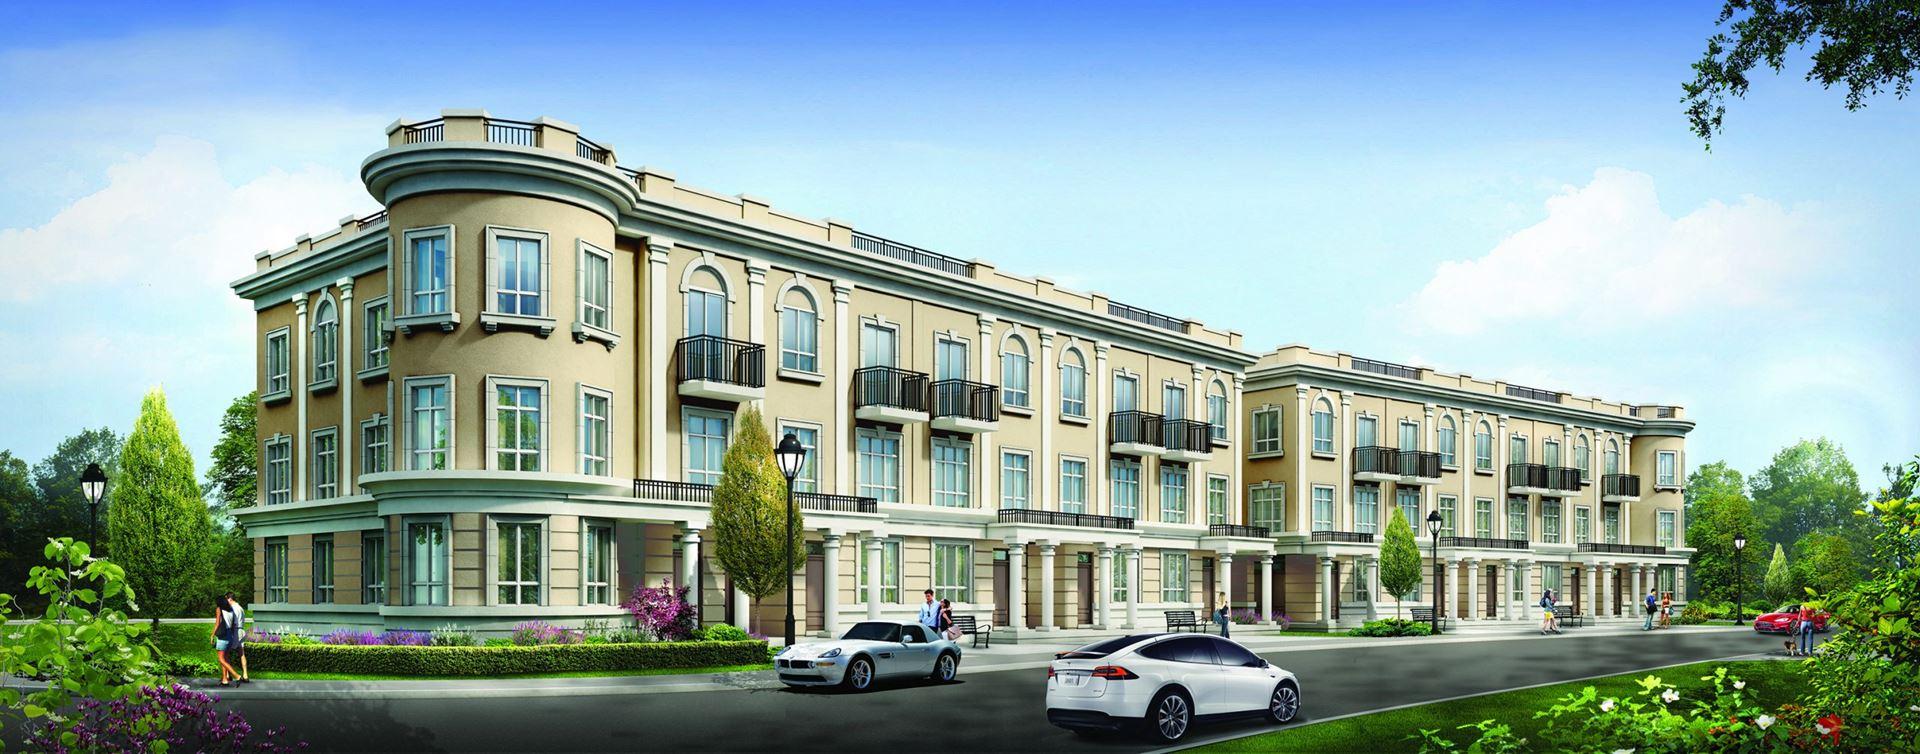 VineRidgeTowns_building_01_cp